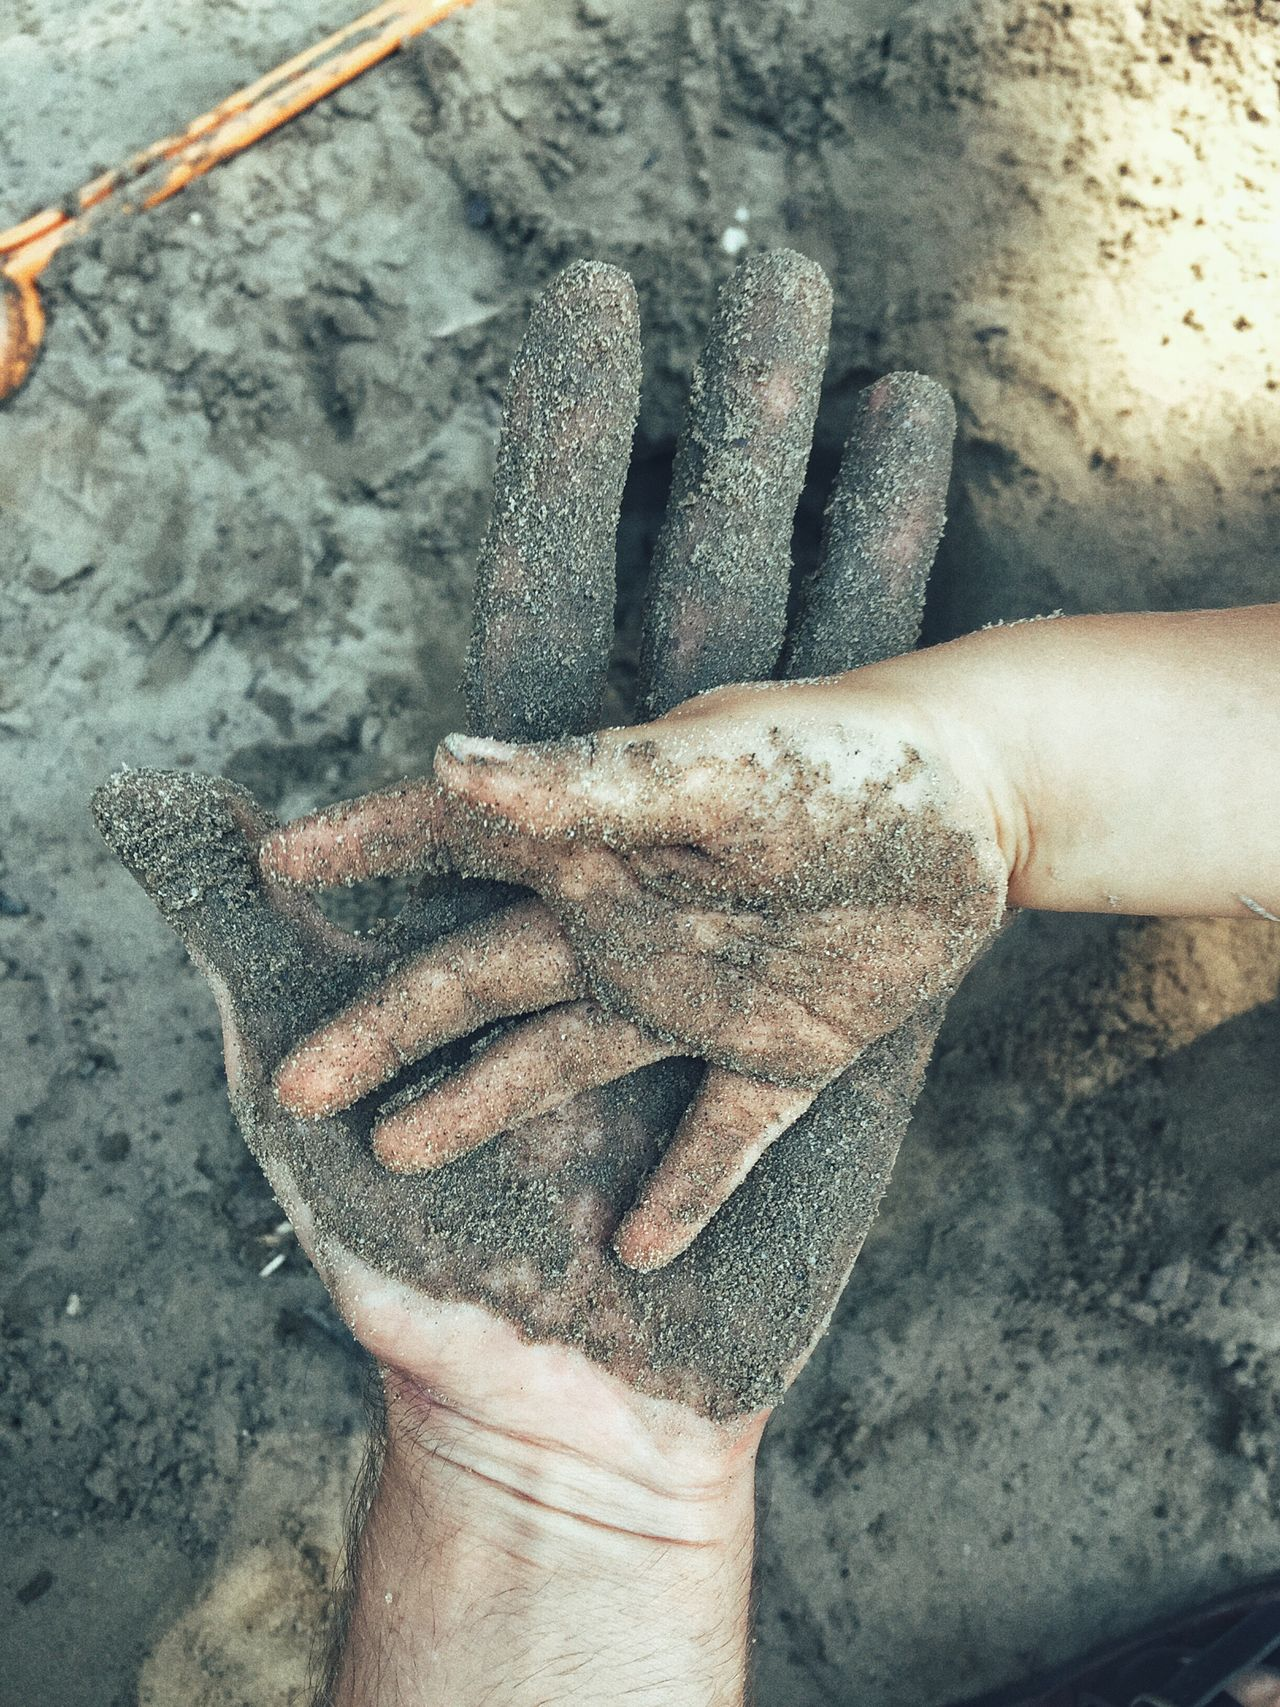 CLOSE-UP OF HUMAN HAND HOLDING CAMERA